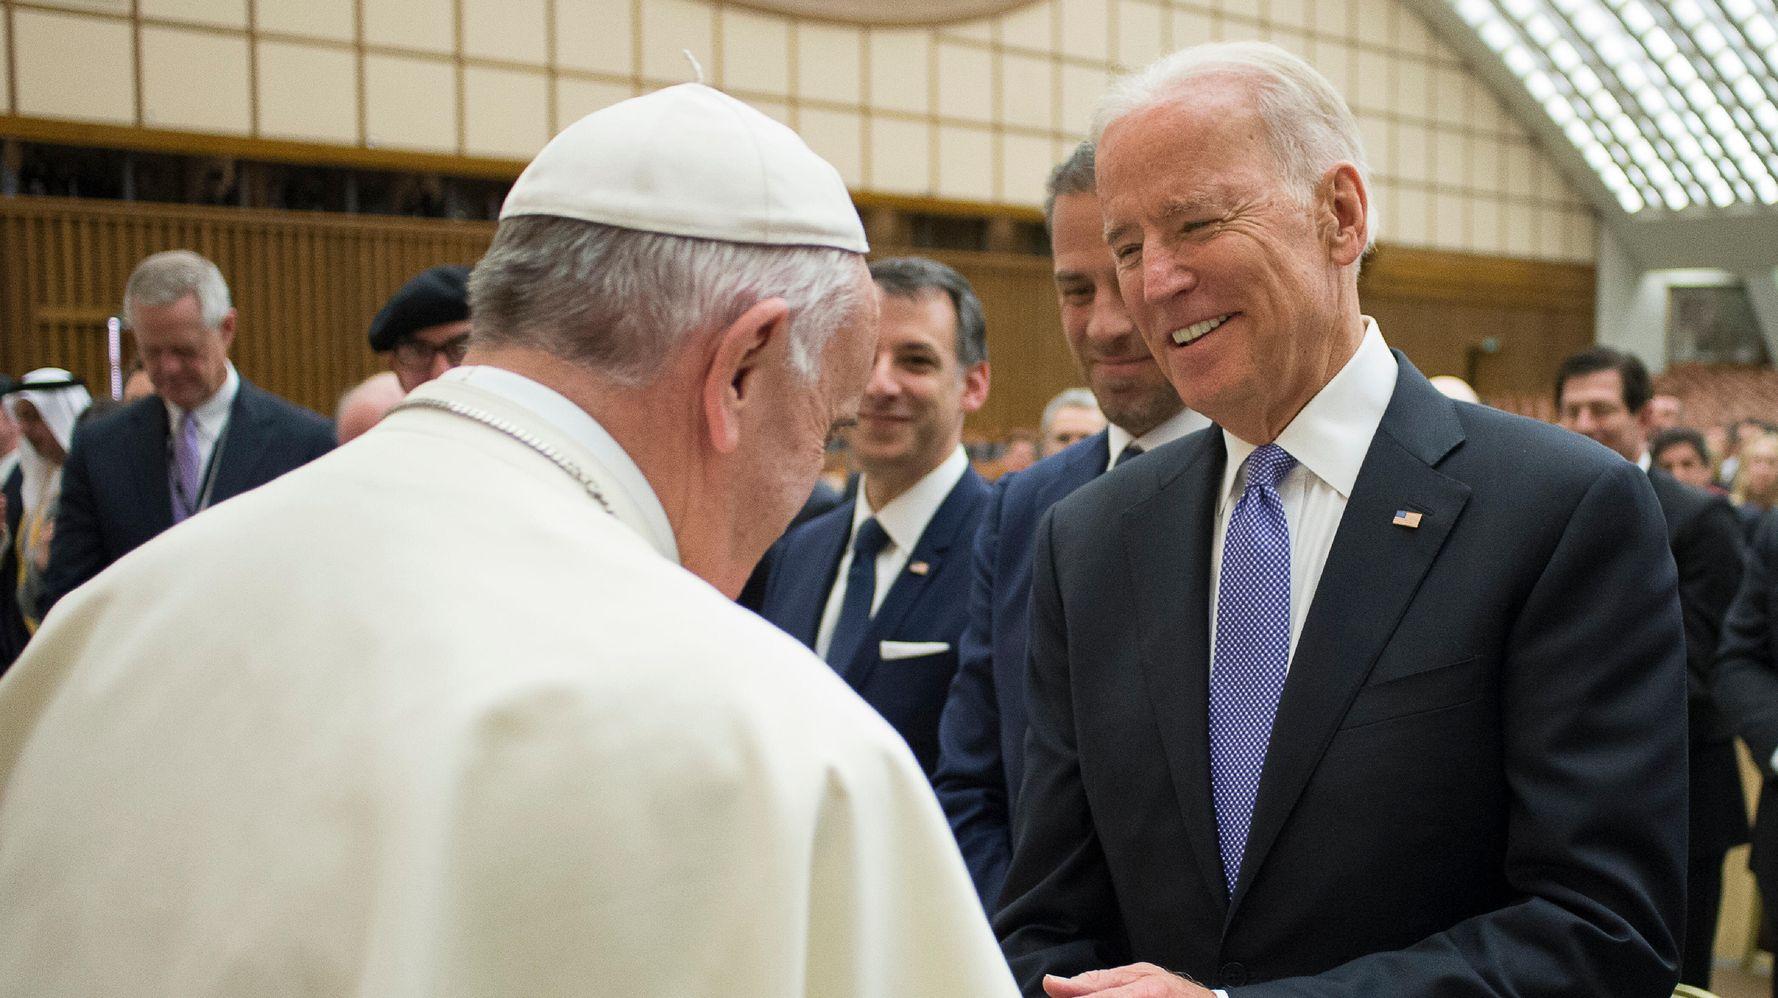 Progressive Catholics Hope Joe Biden Will Highlight The Kinder Side Of Faith